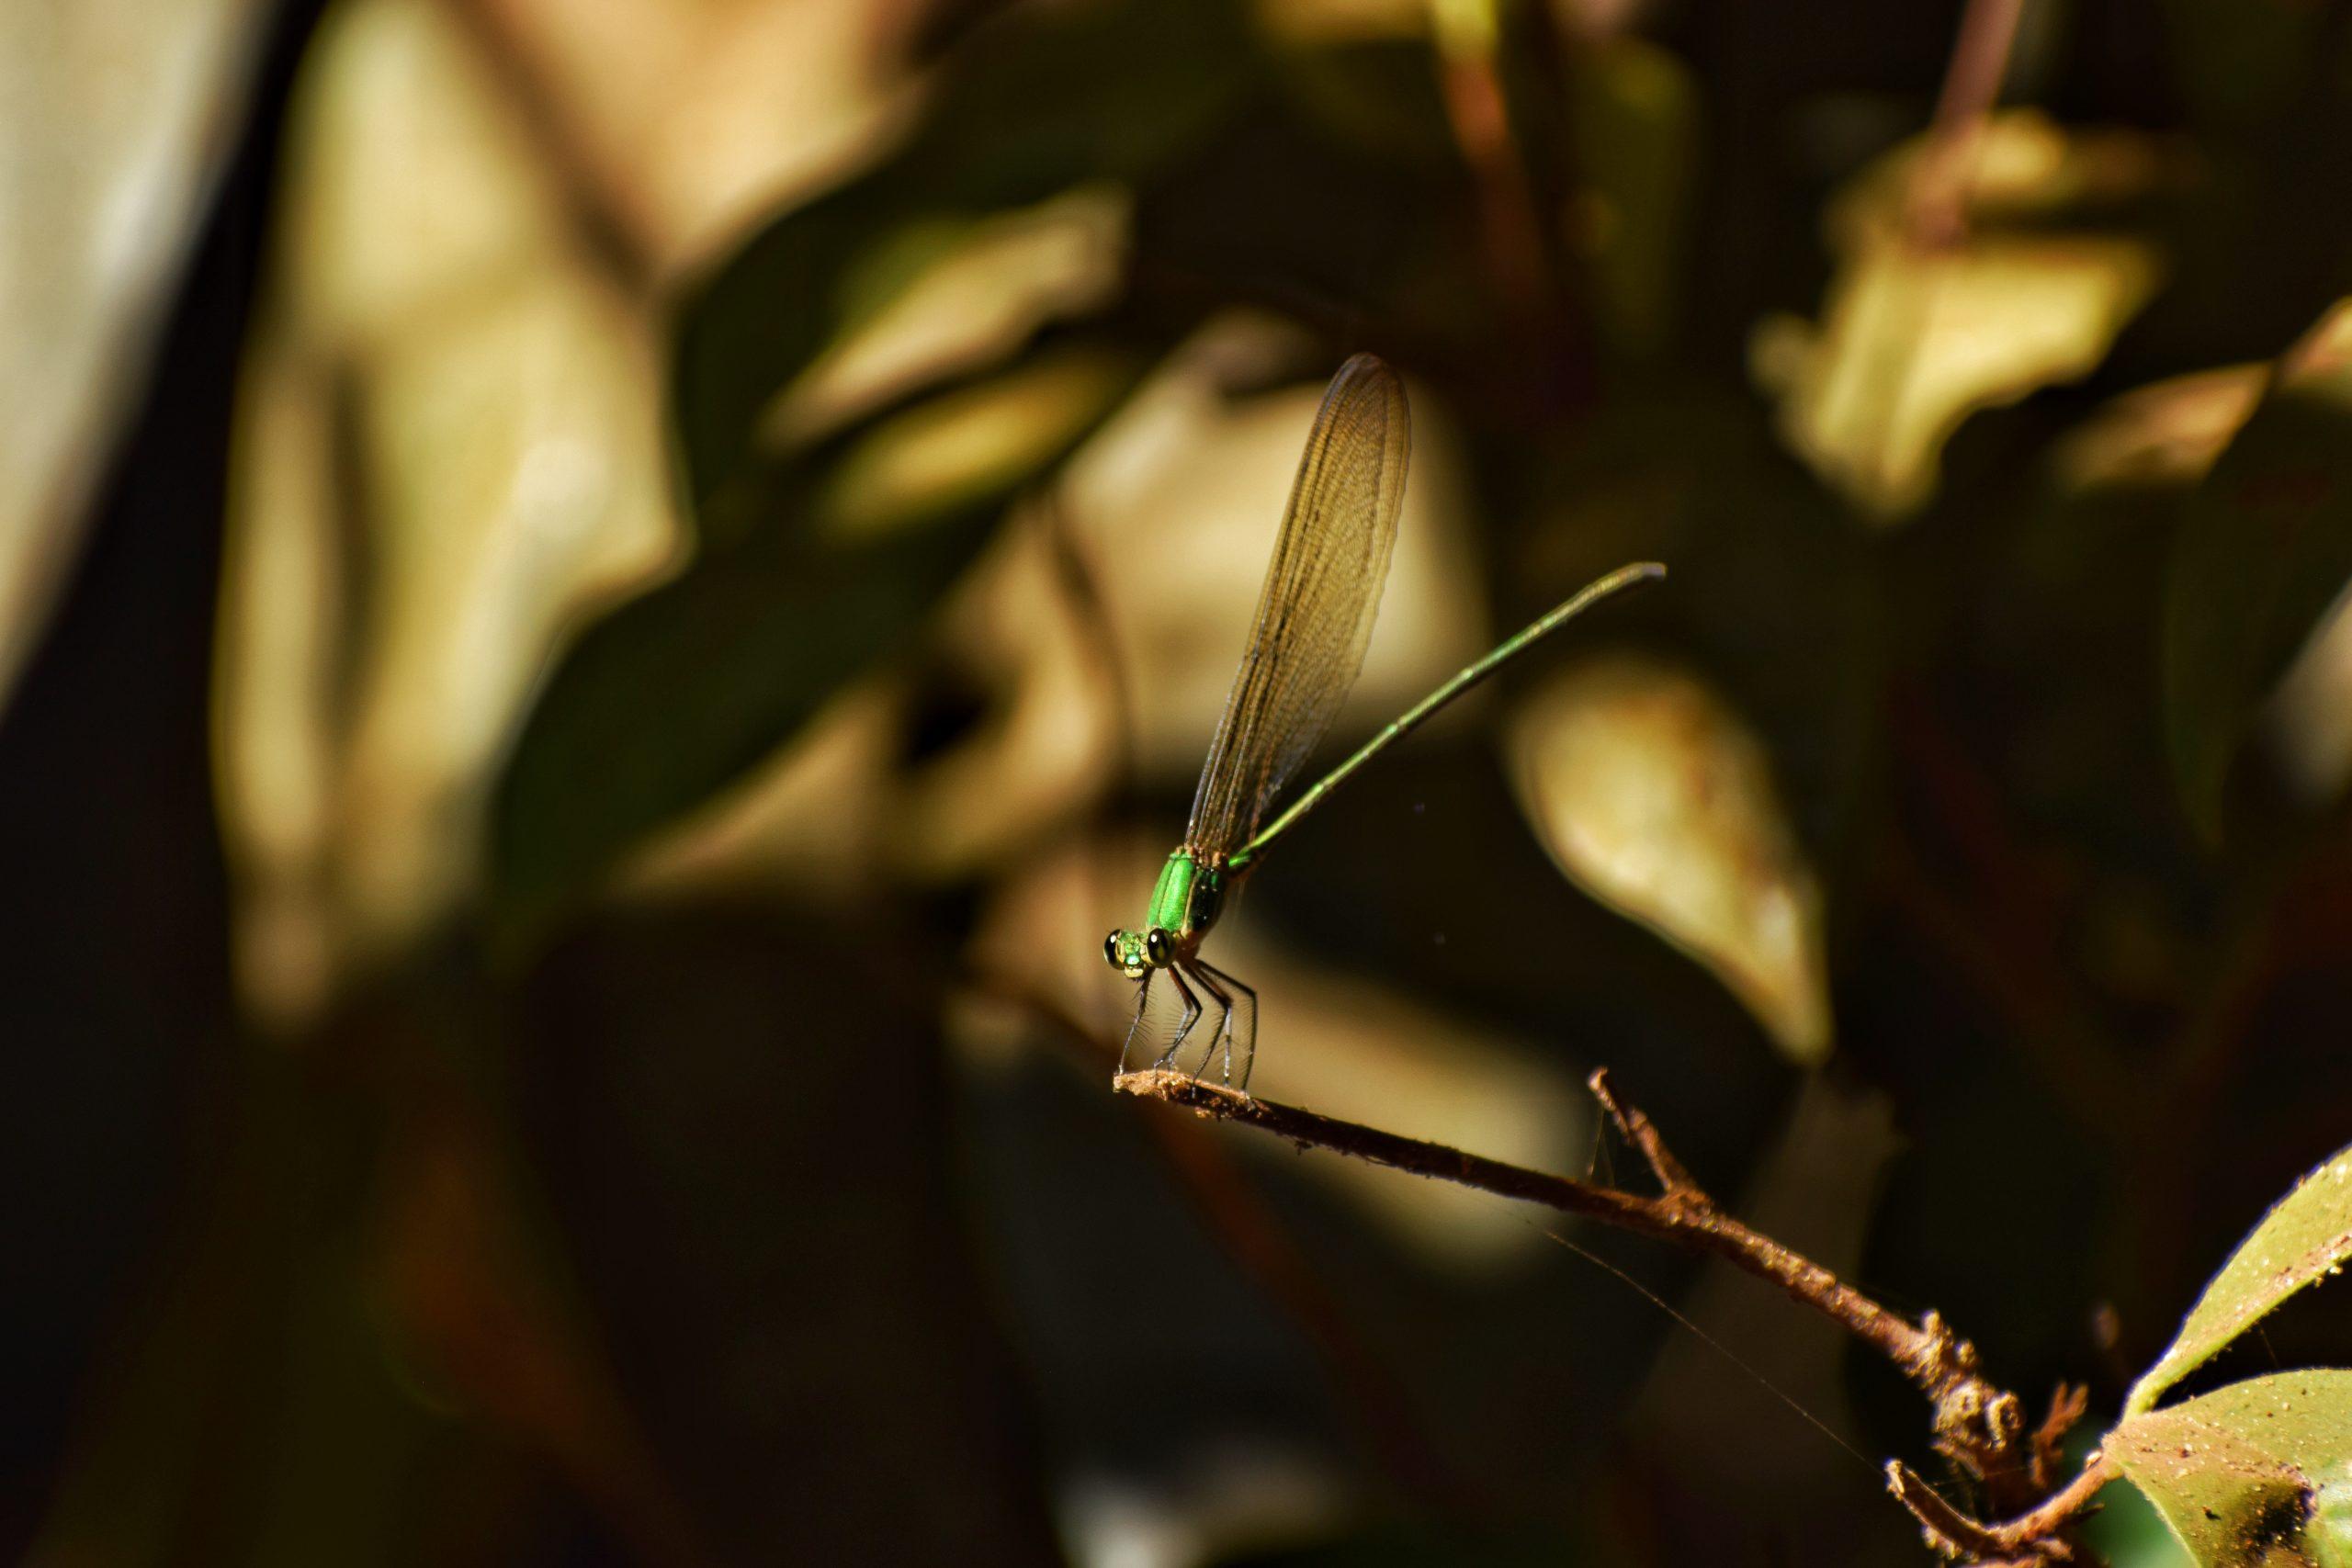 A dragonfly on a straw